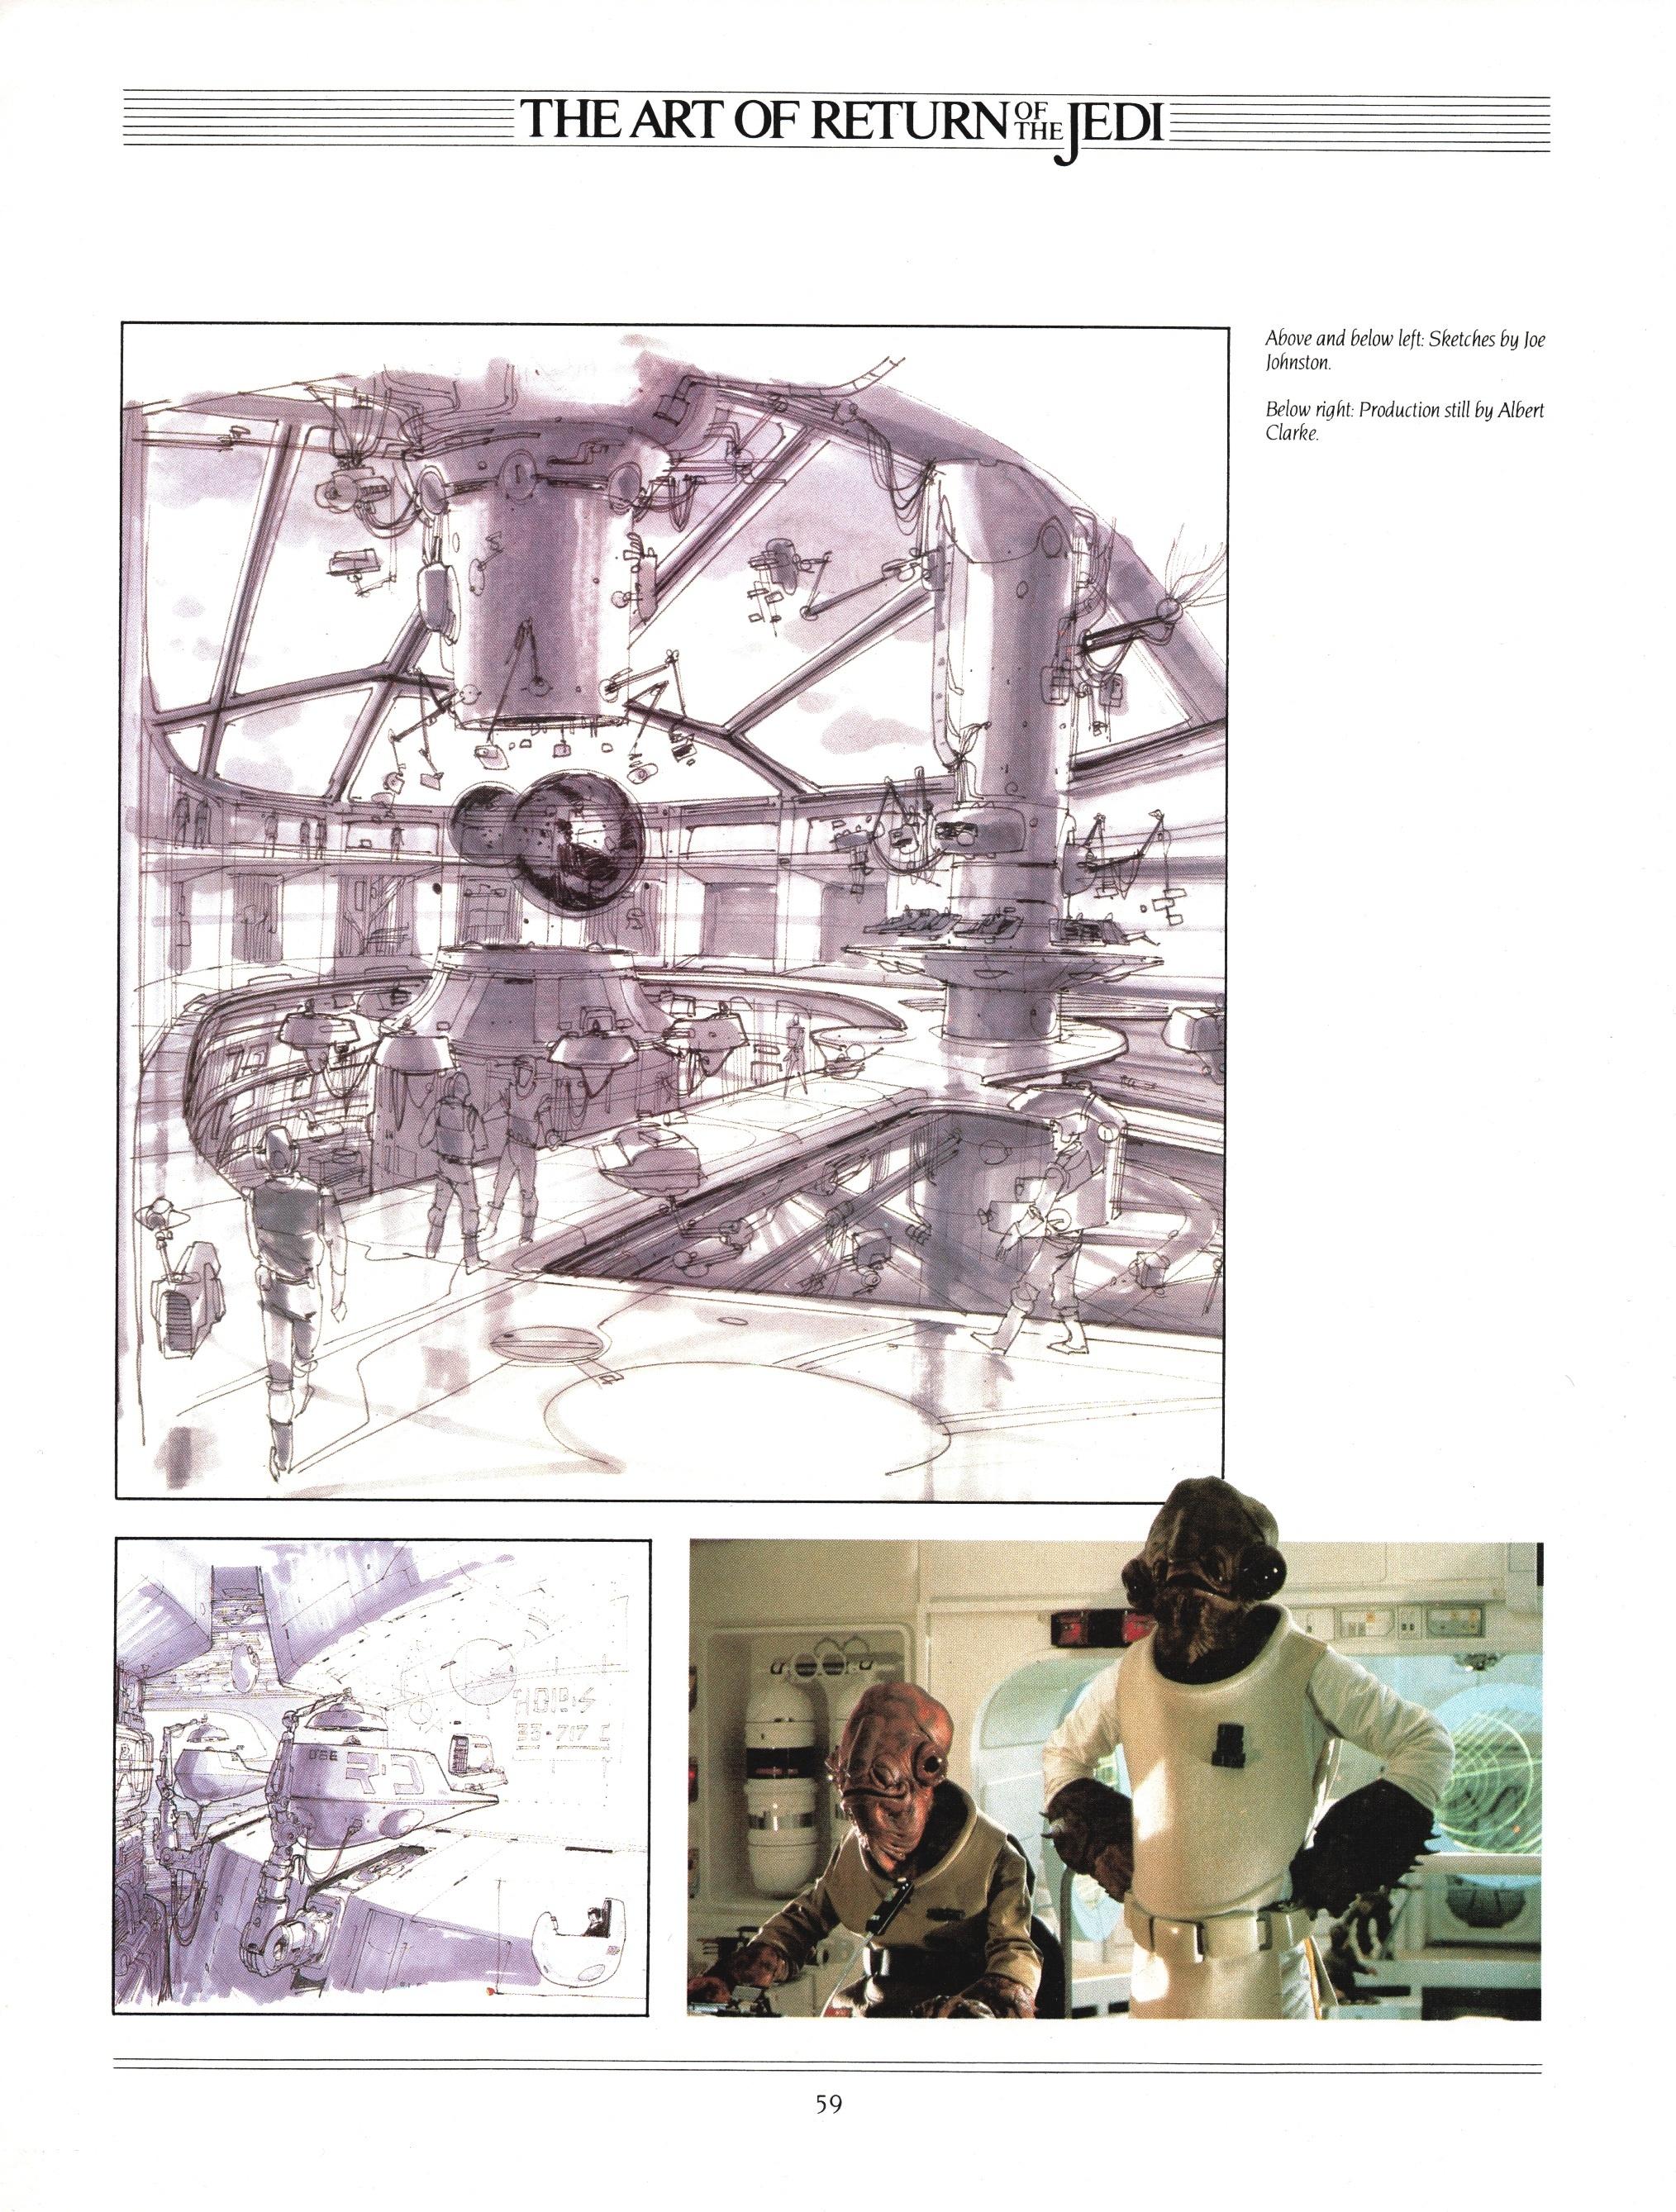 Art of Return of the Jedi (b0bafett_Empire)-p059